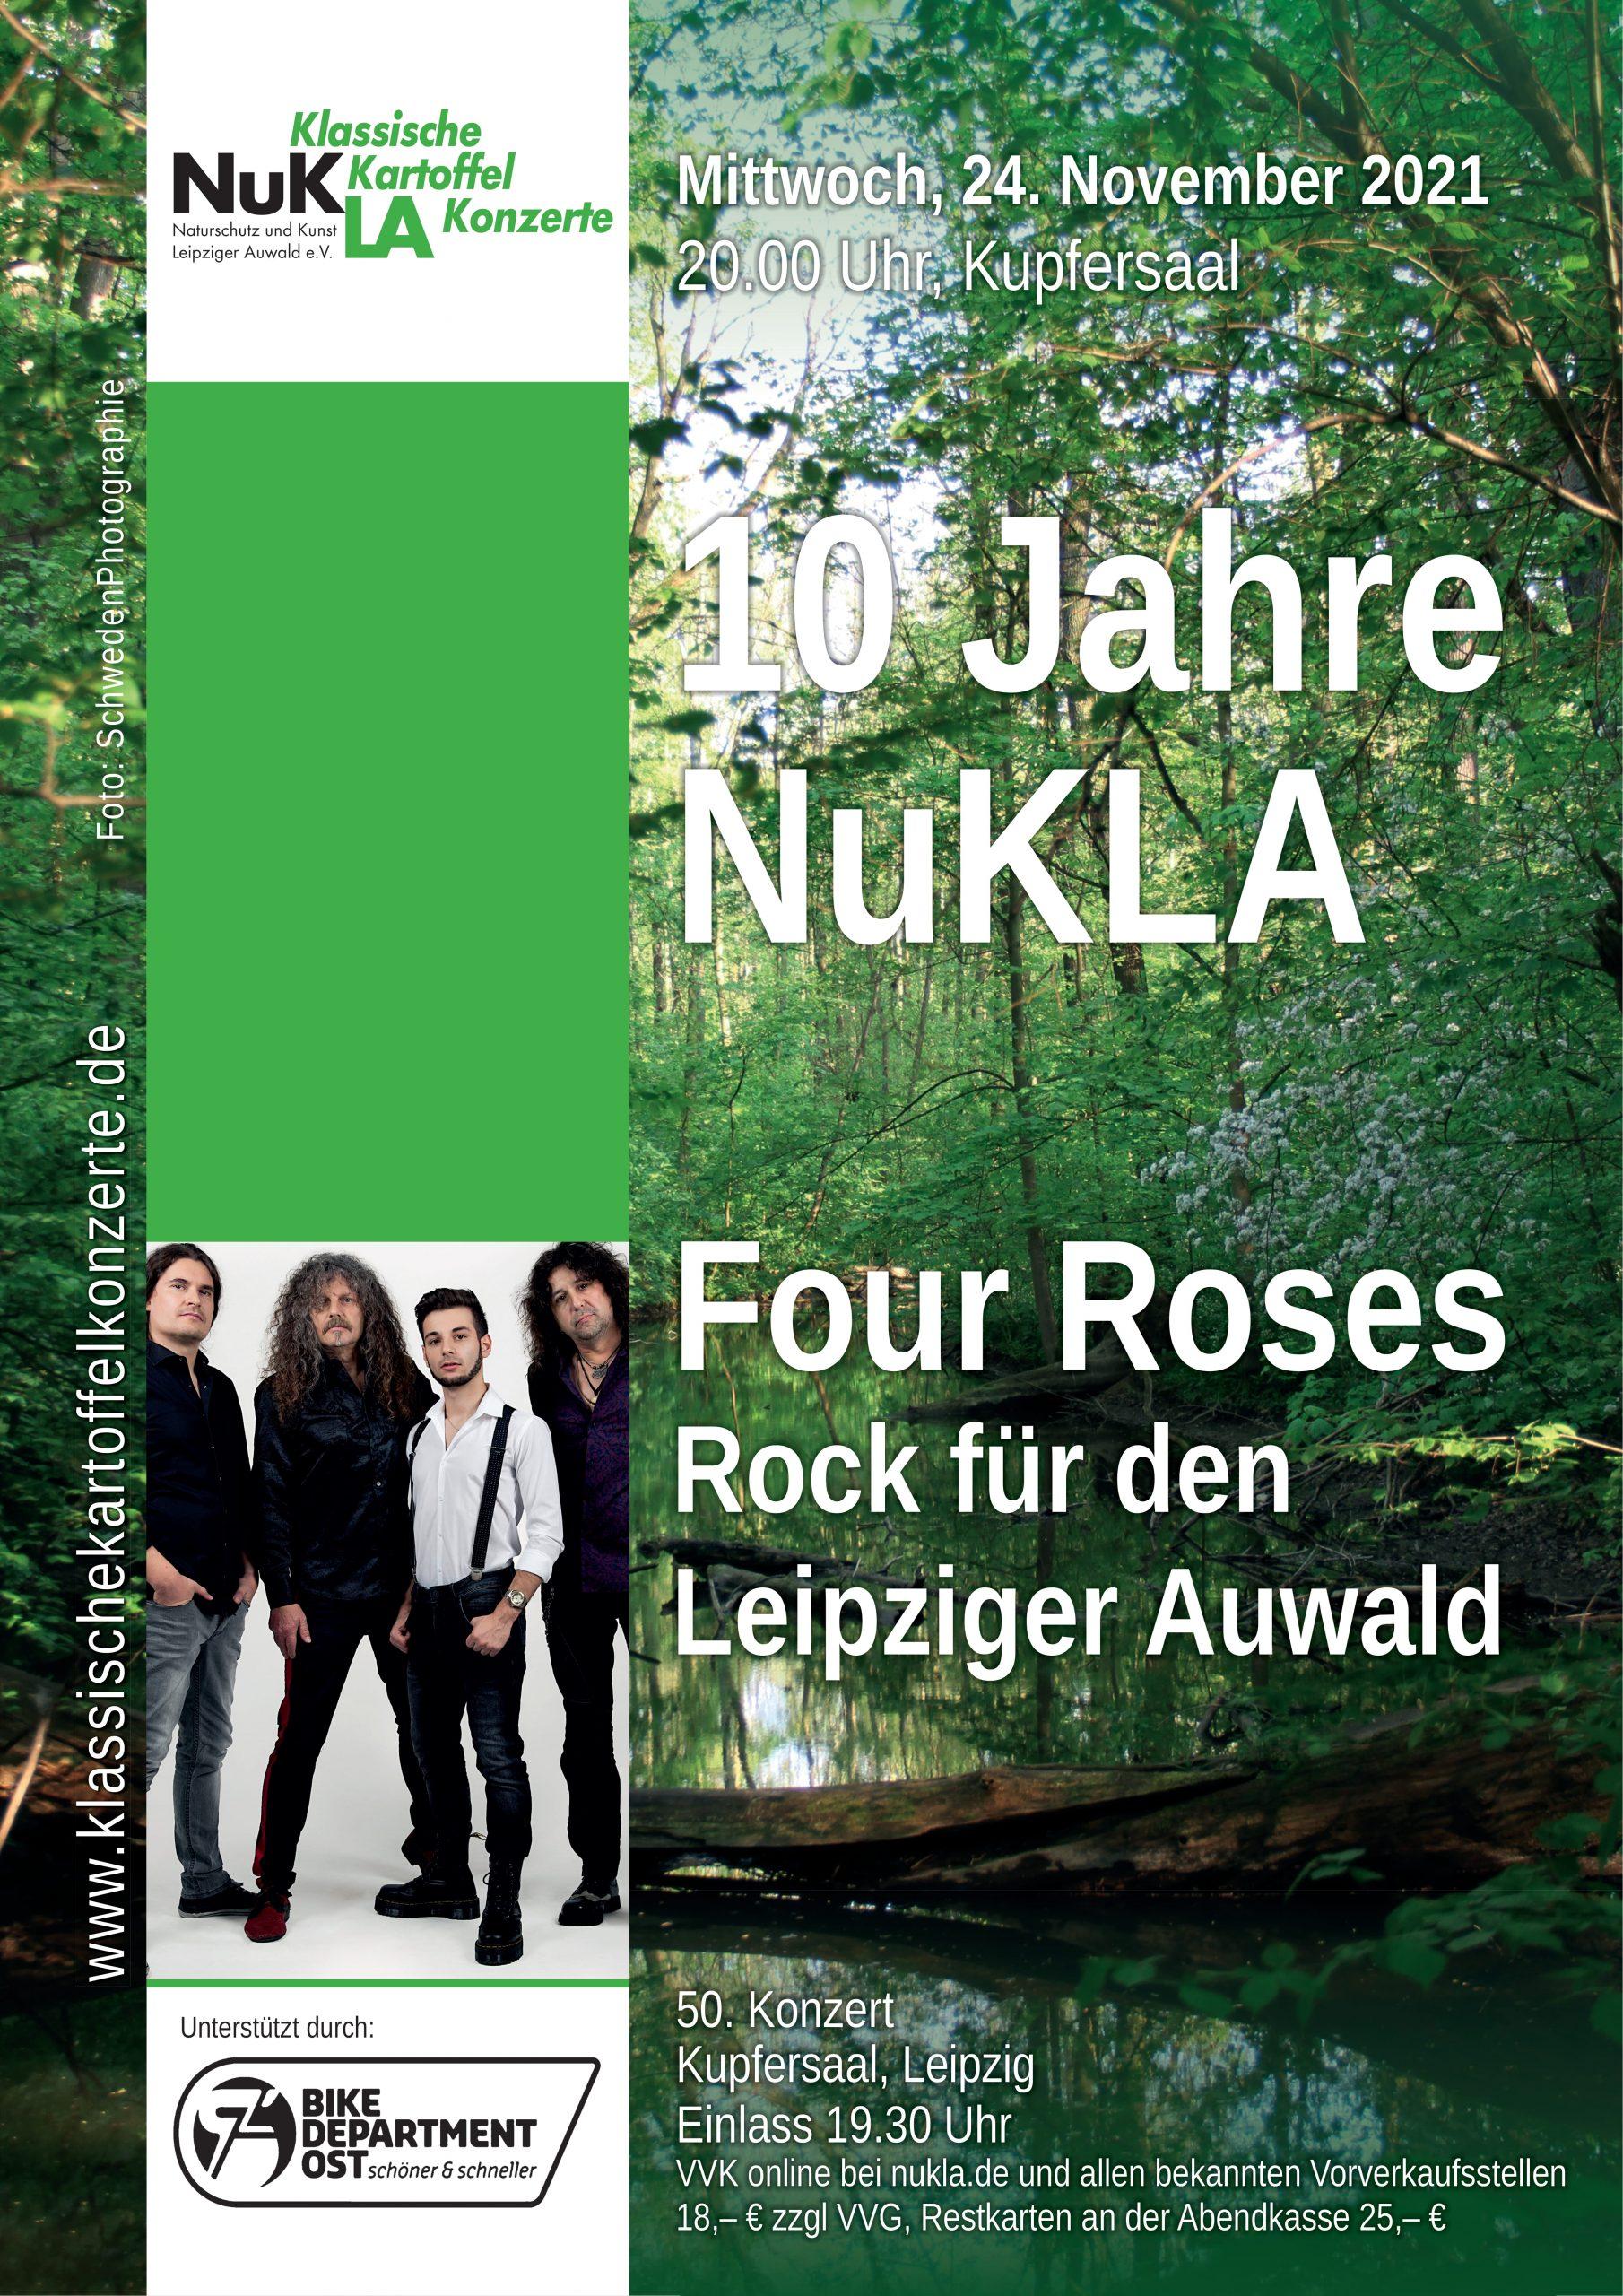 10 Jahre NuKLA mit Four Roses